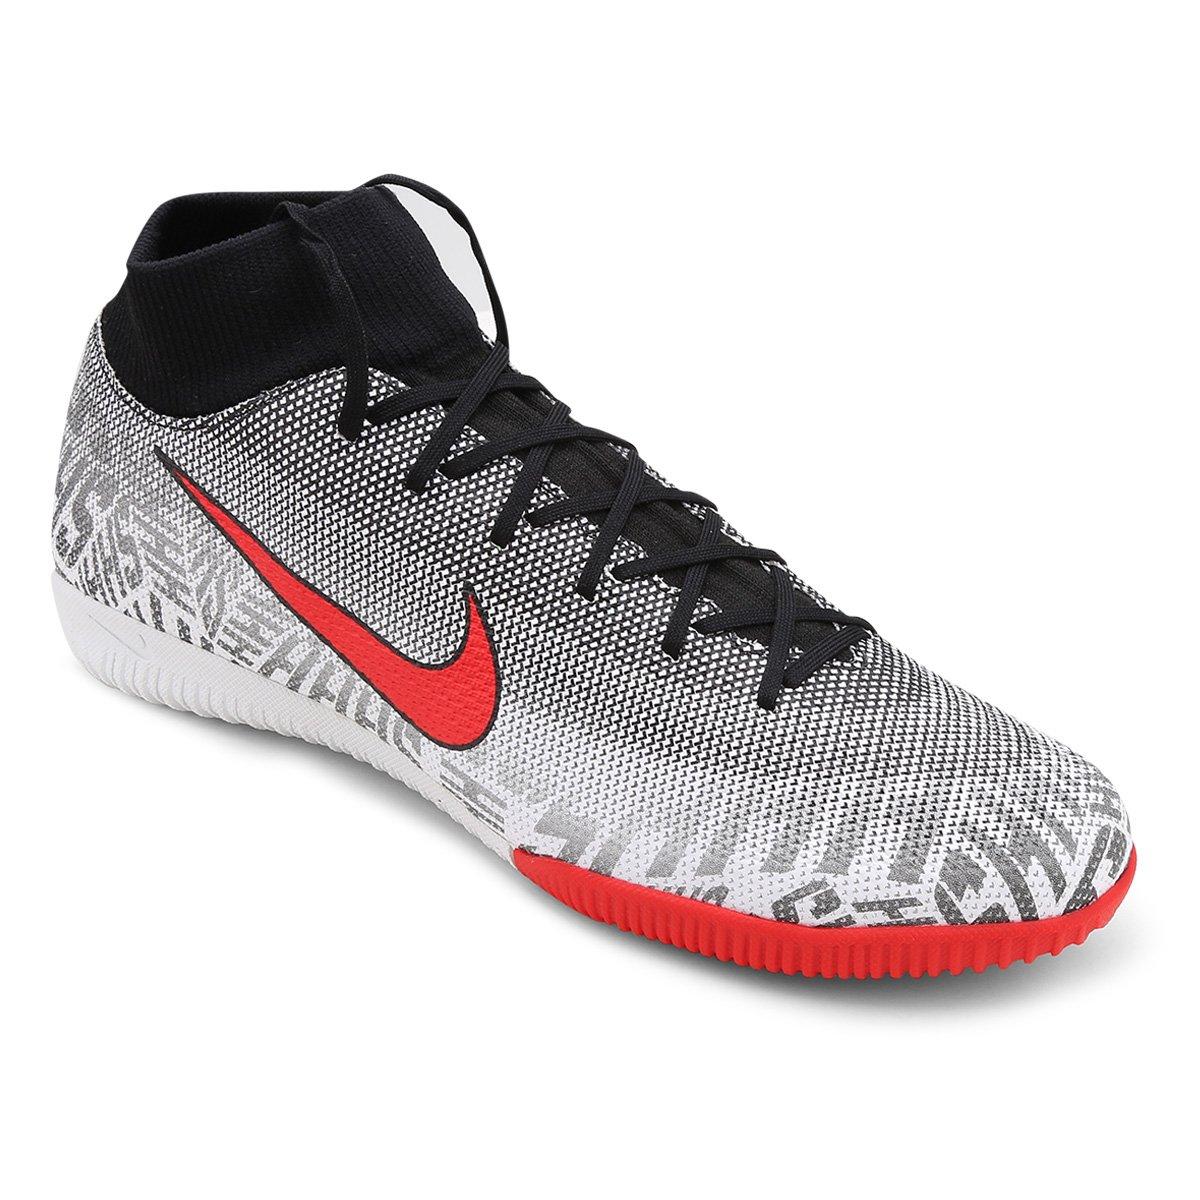 zapatos genuinos gran descuento marca famosa Chuteira Futsal Nike Mercurial Superfly 6 Academy Neymar Jr ...